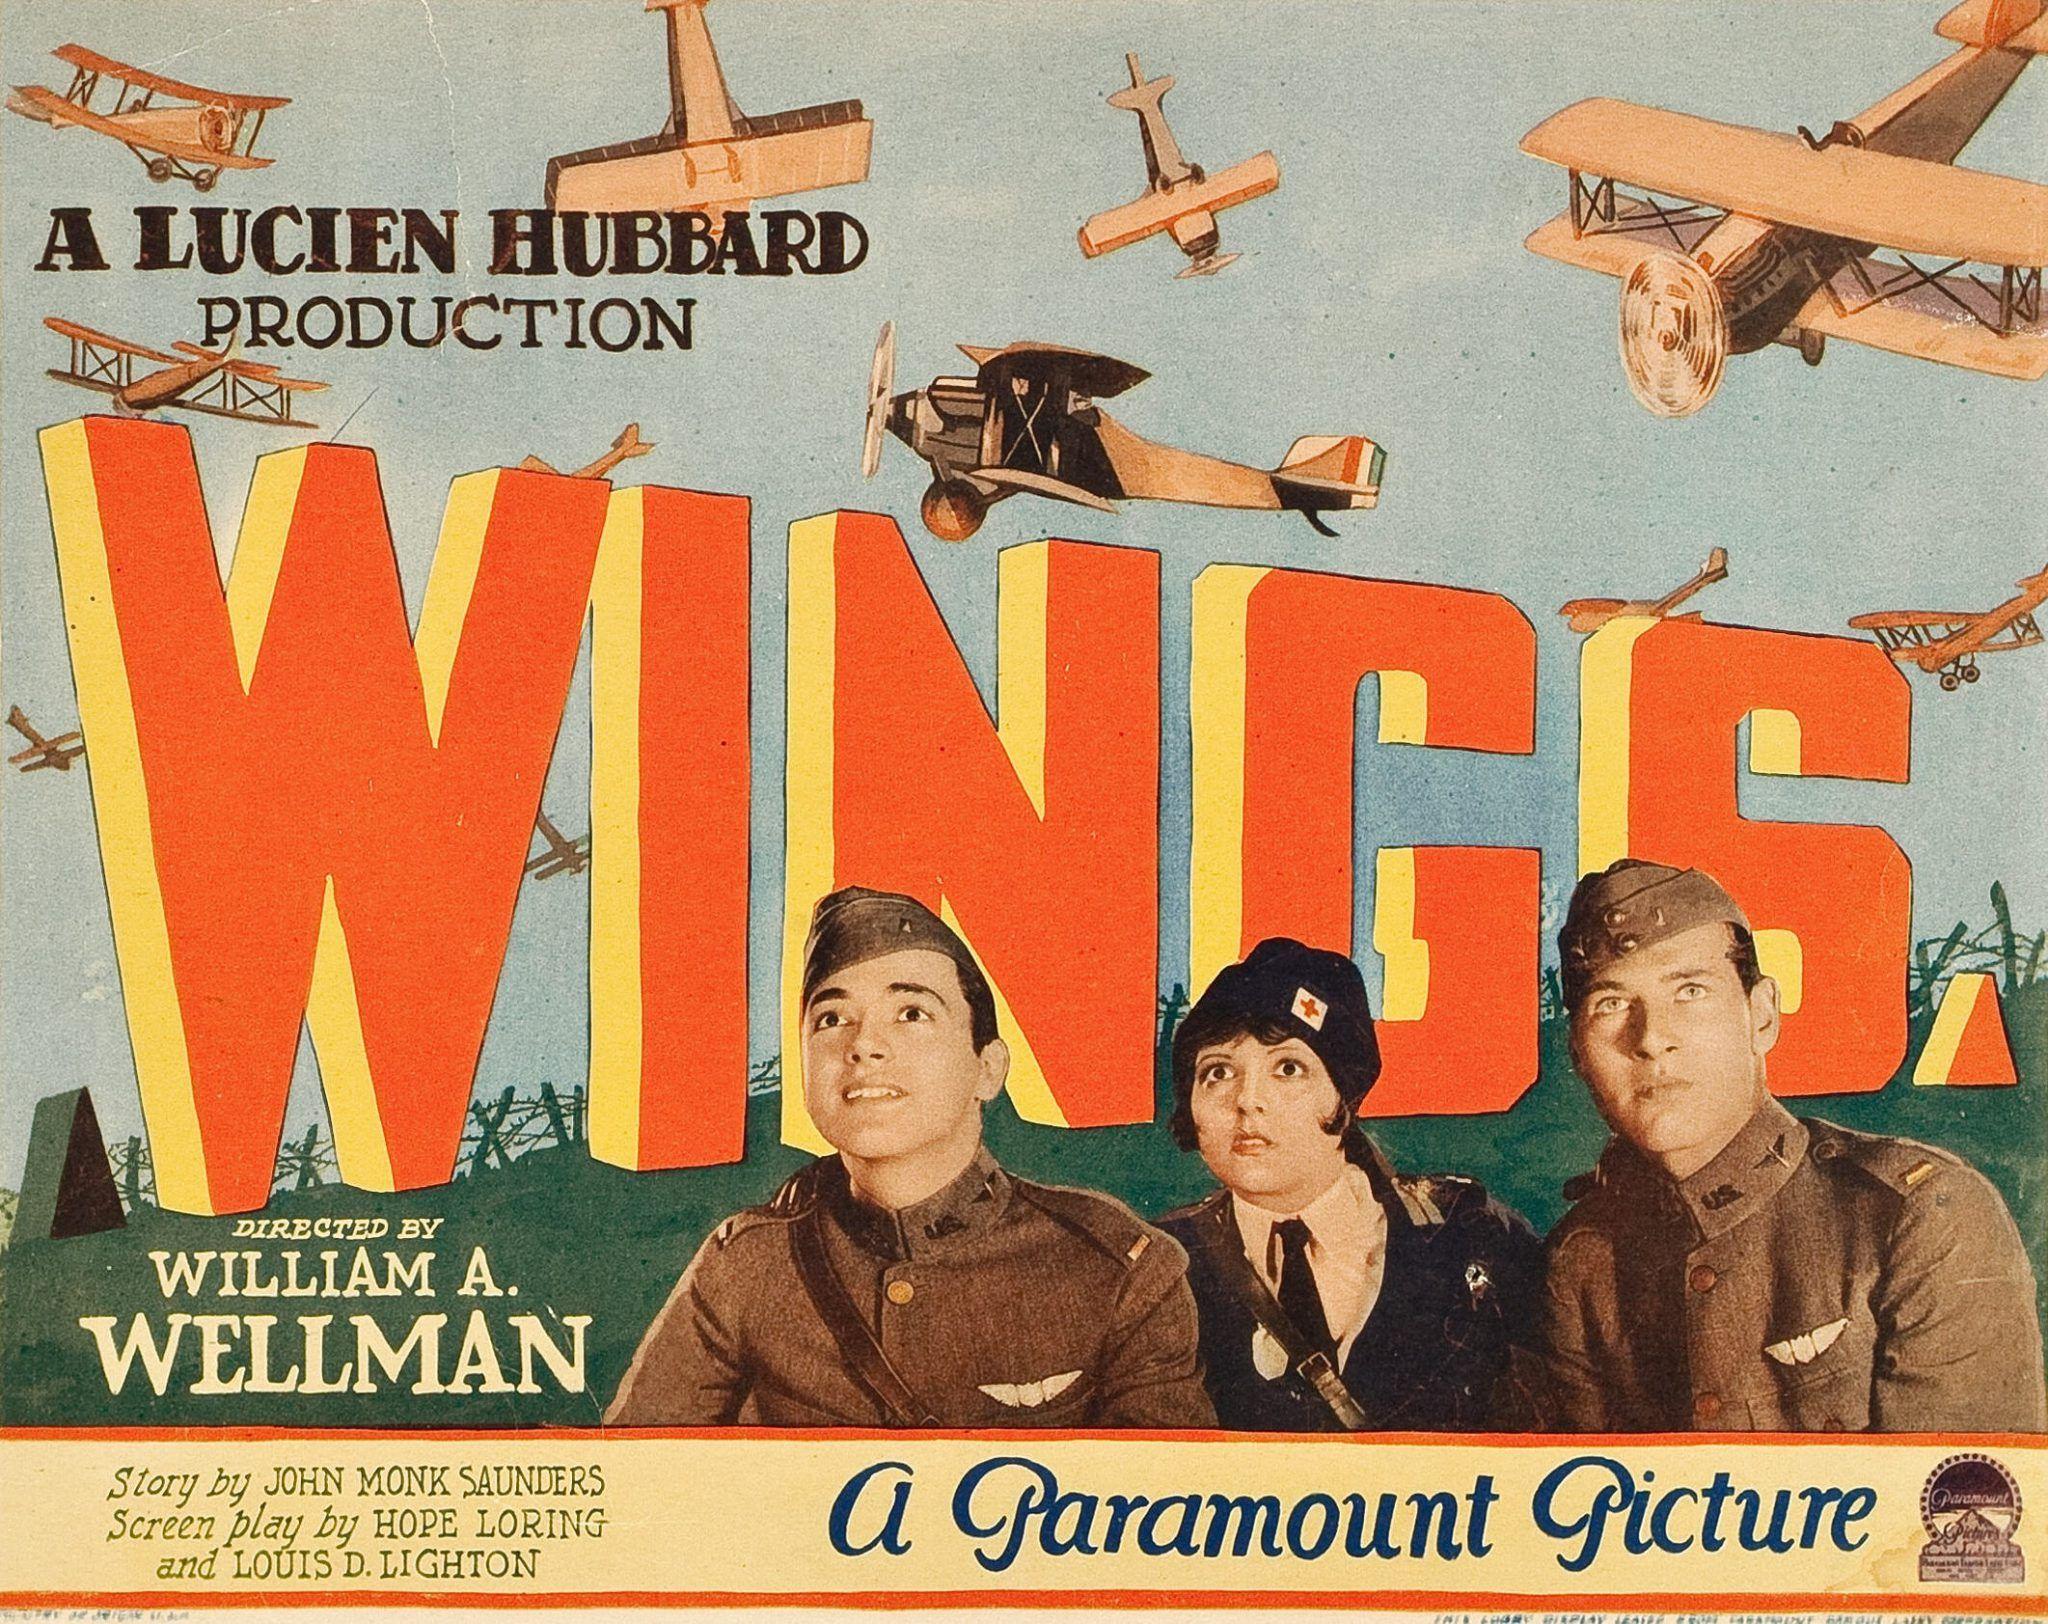 Travelling película Wings (Alas) de William A. Wellman, 1927